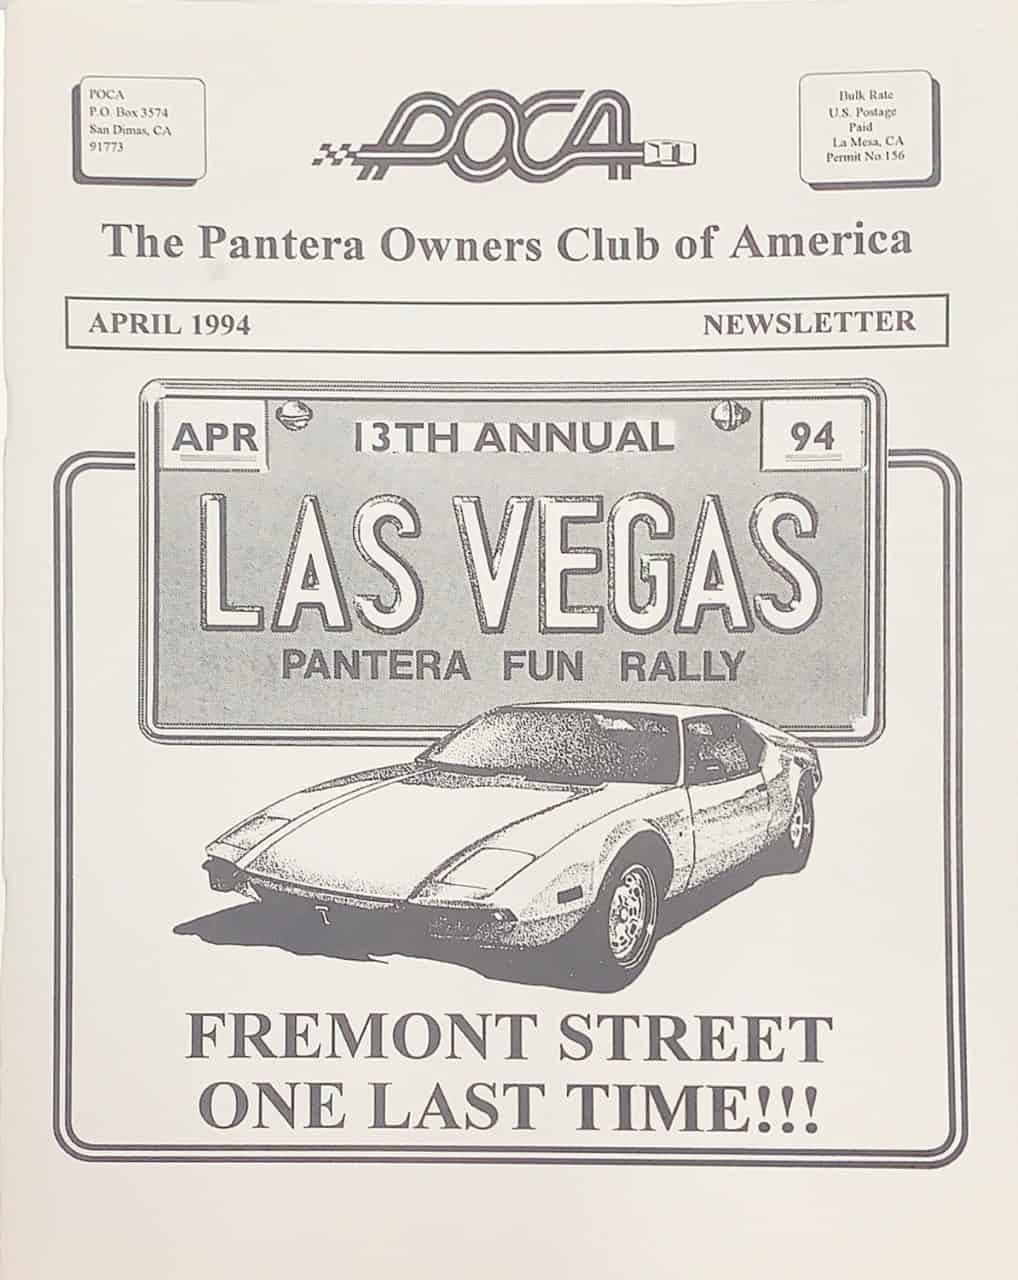 Pantera Club newsletter